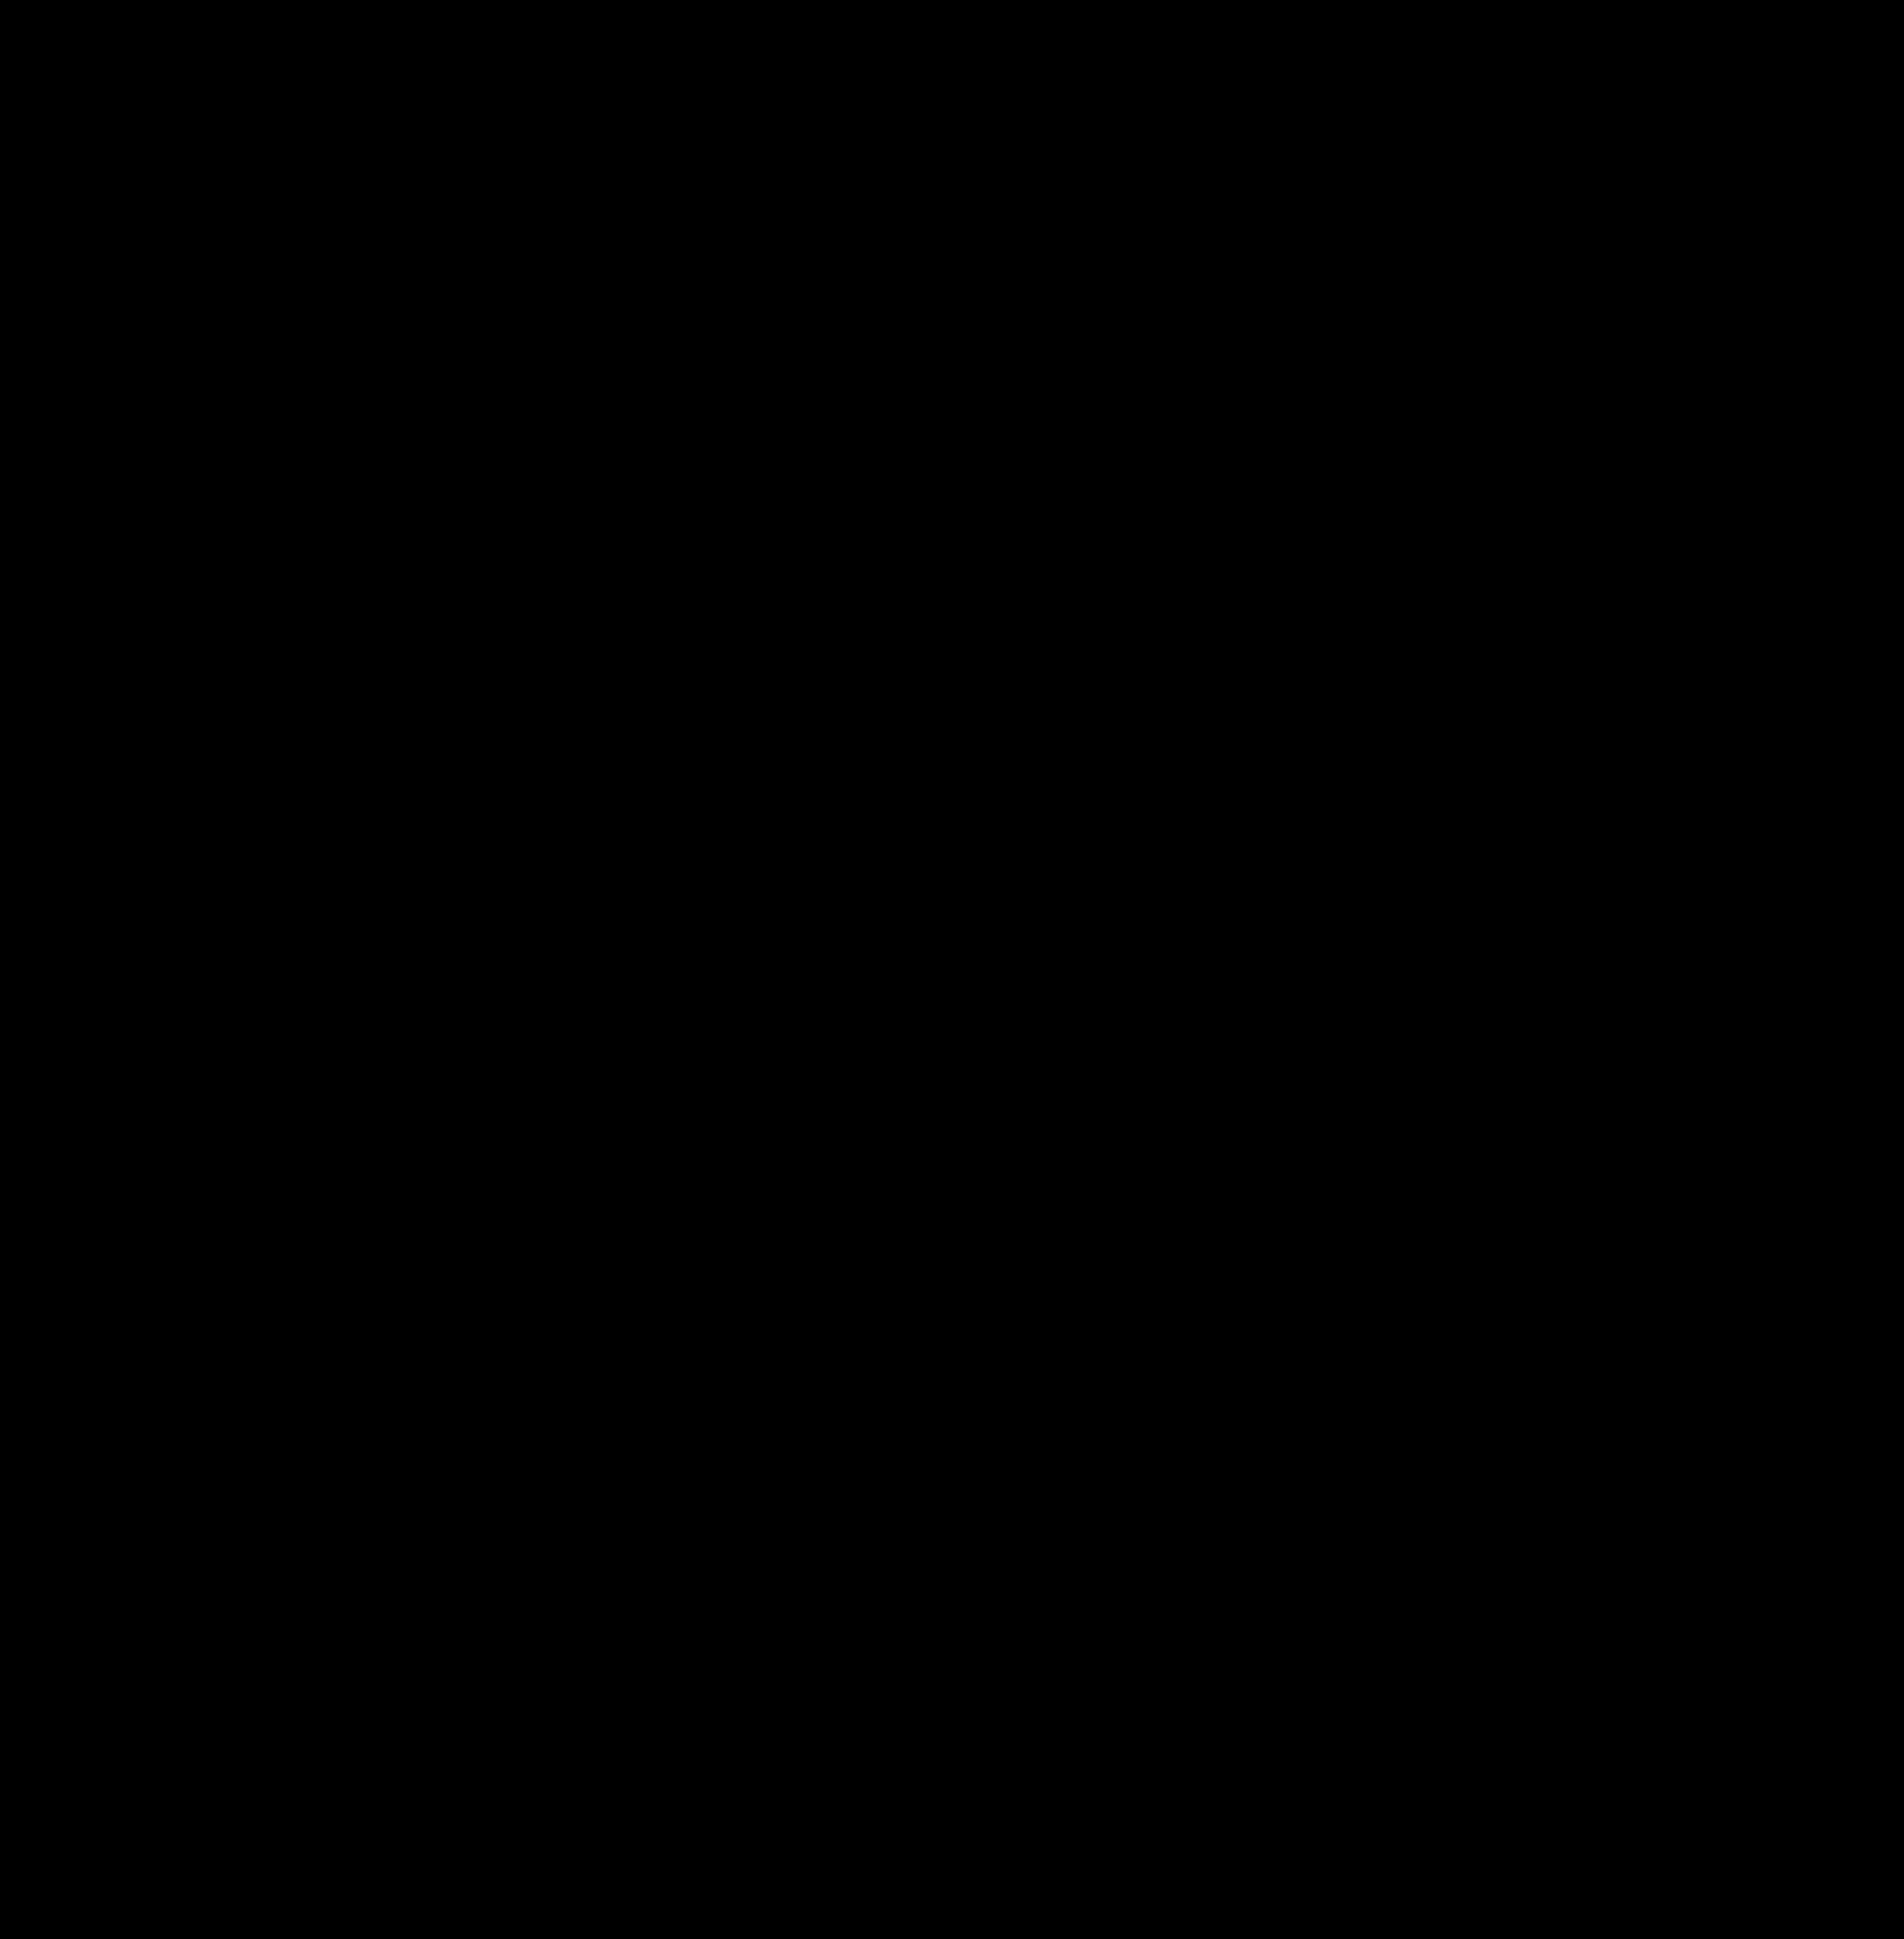 Dhahran High School LOGO Logo PNG Transparent & SVG Vector.